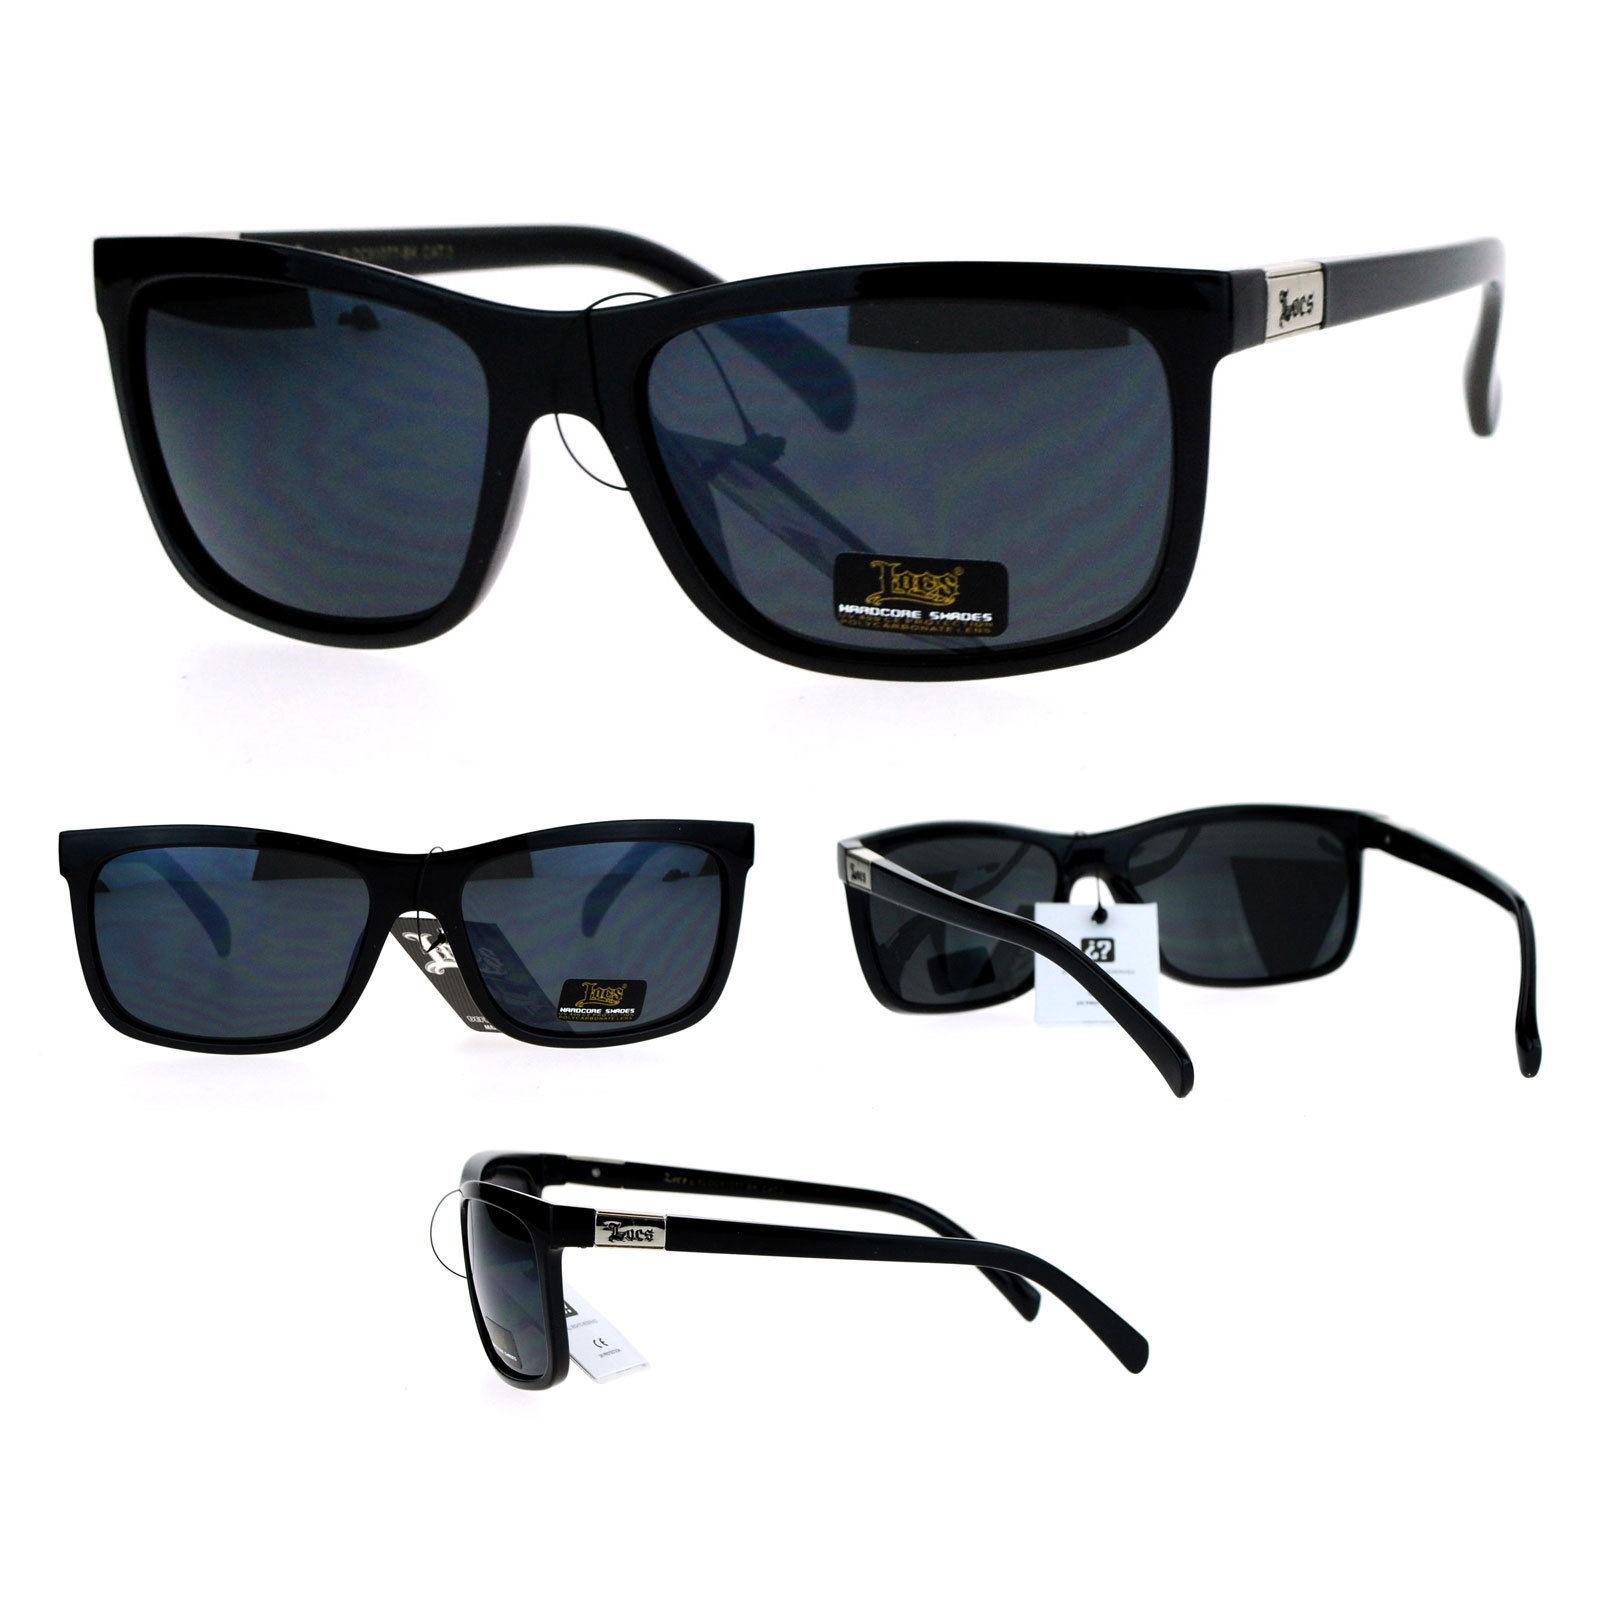 d385ef377d5 Locs Gangster Thin Plastic All Black Mens Cholo Sunglasses - Sunglasses